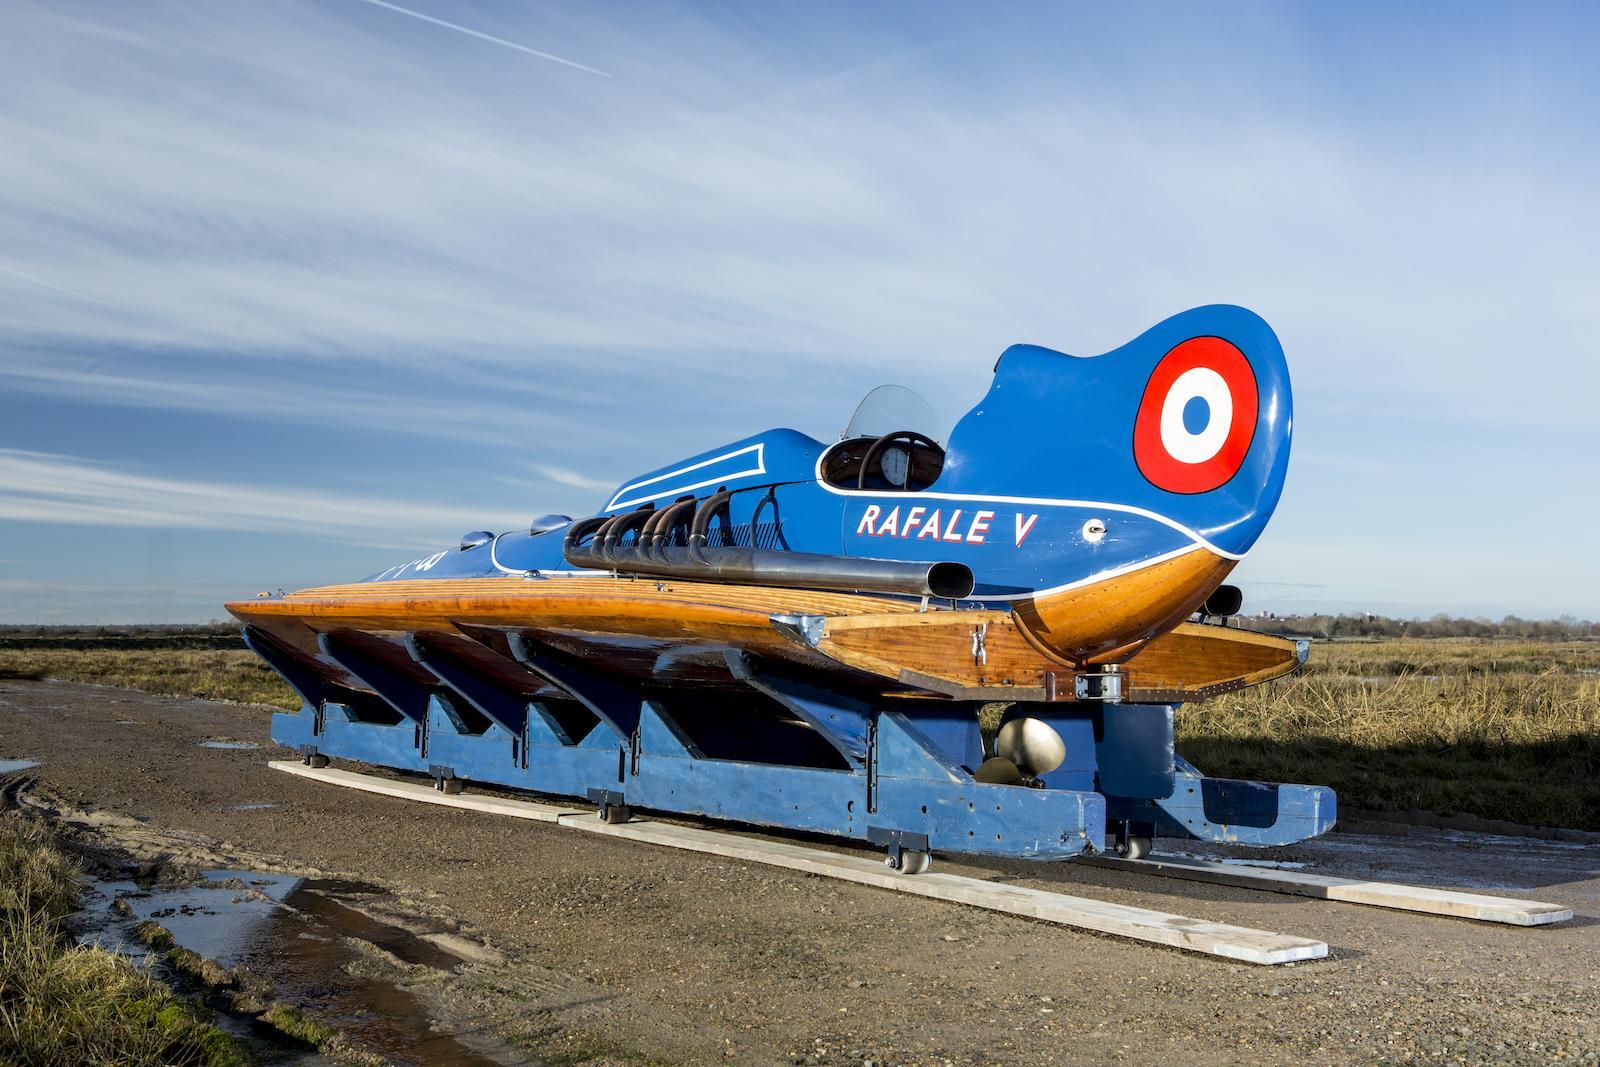 Bonhams to sell record-breaking Hispano-Suiza hydroplane